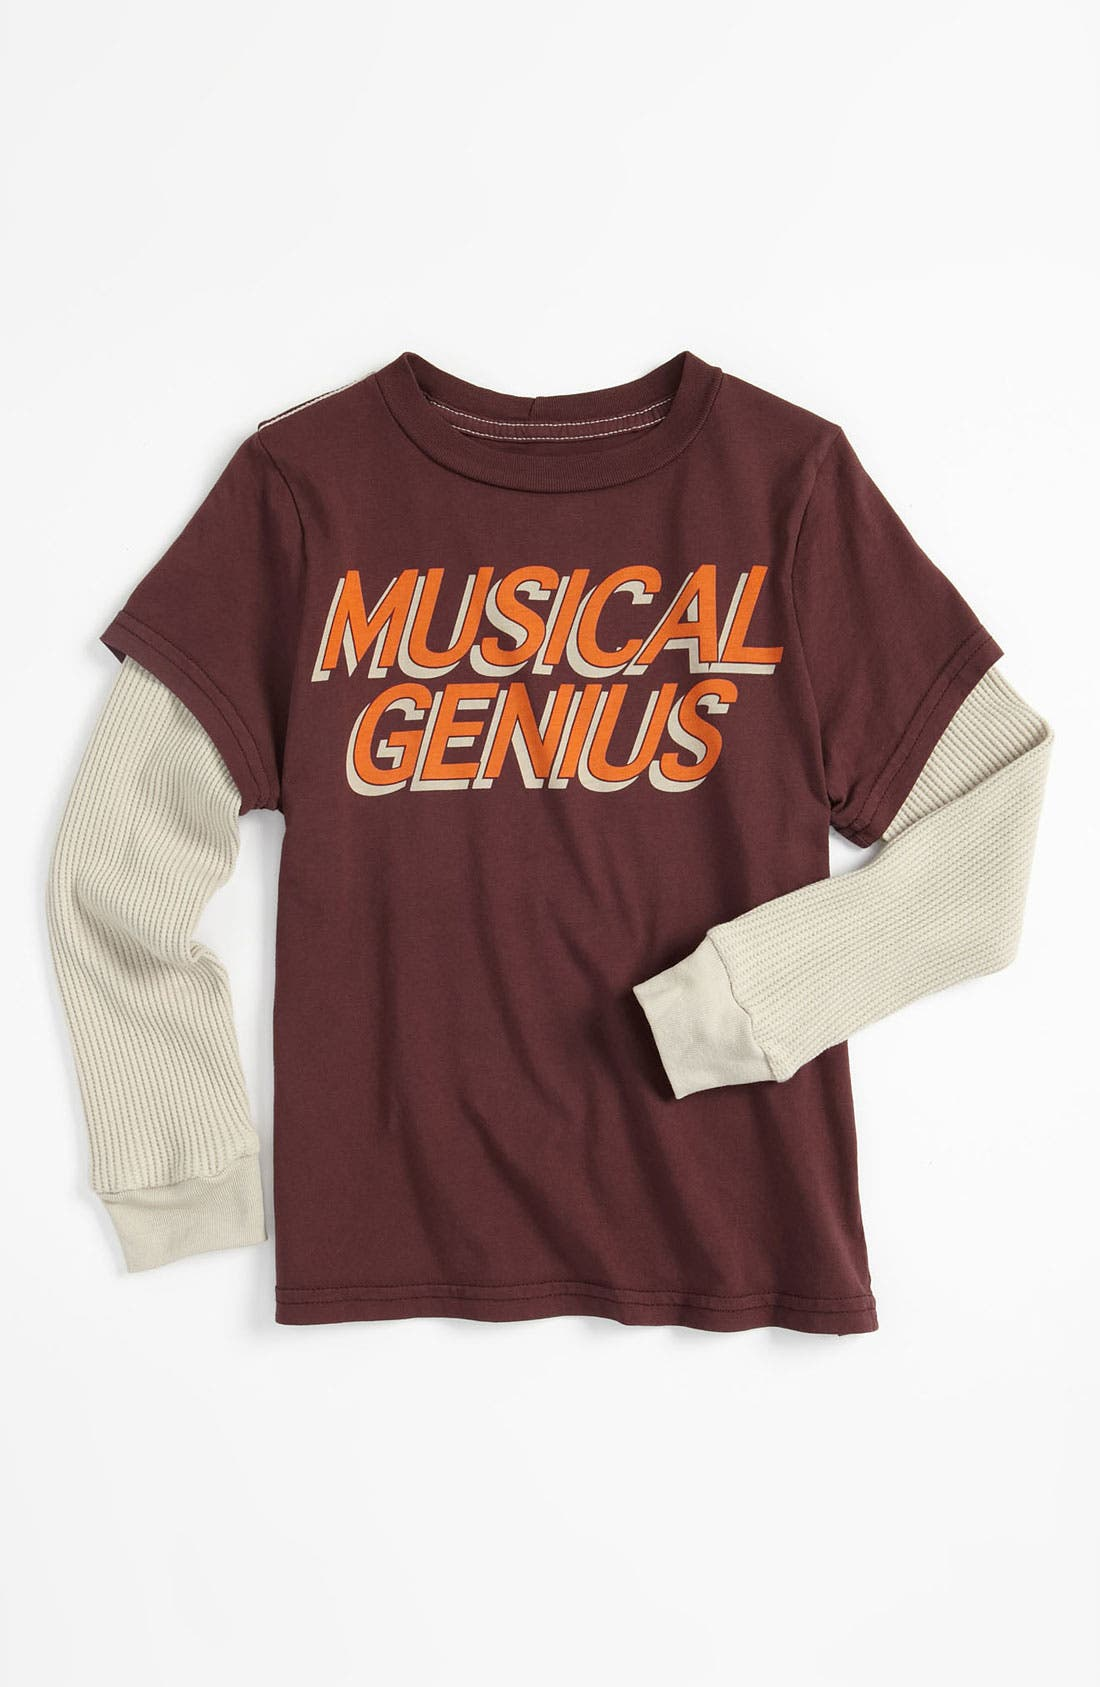 Alternate Image 1 Selected - Peek 'Musical Genius' T-Shirt (Toddler, Little Boys & Big Boys)